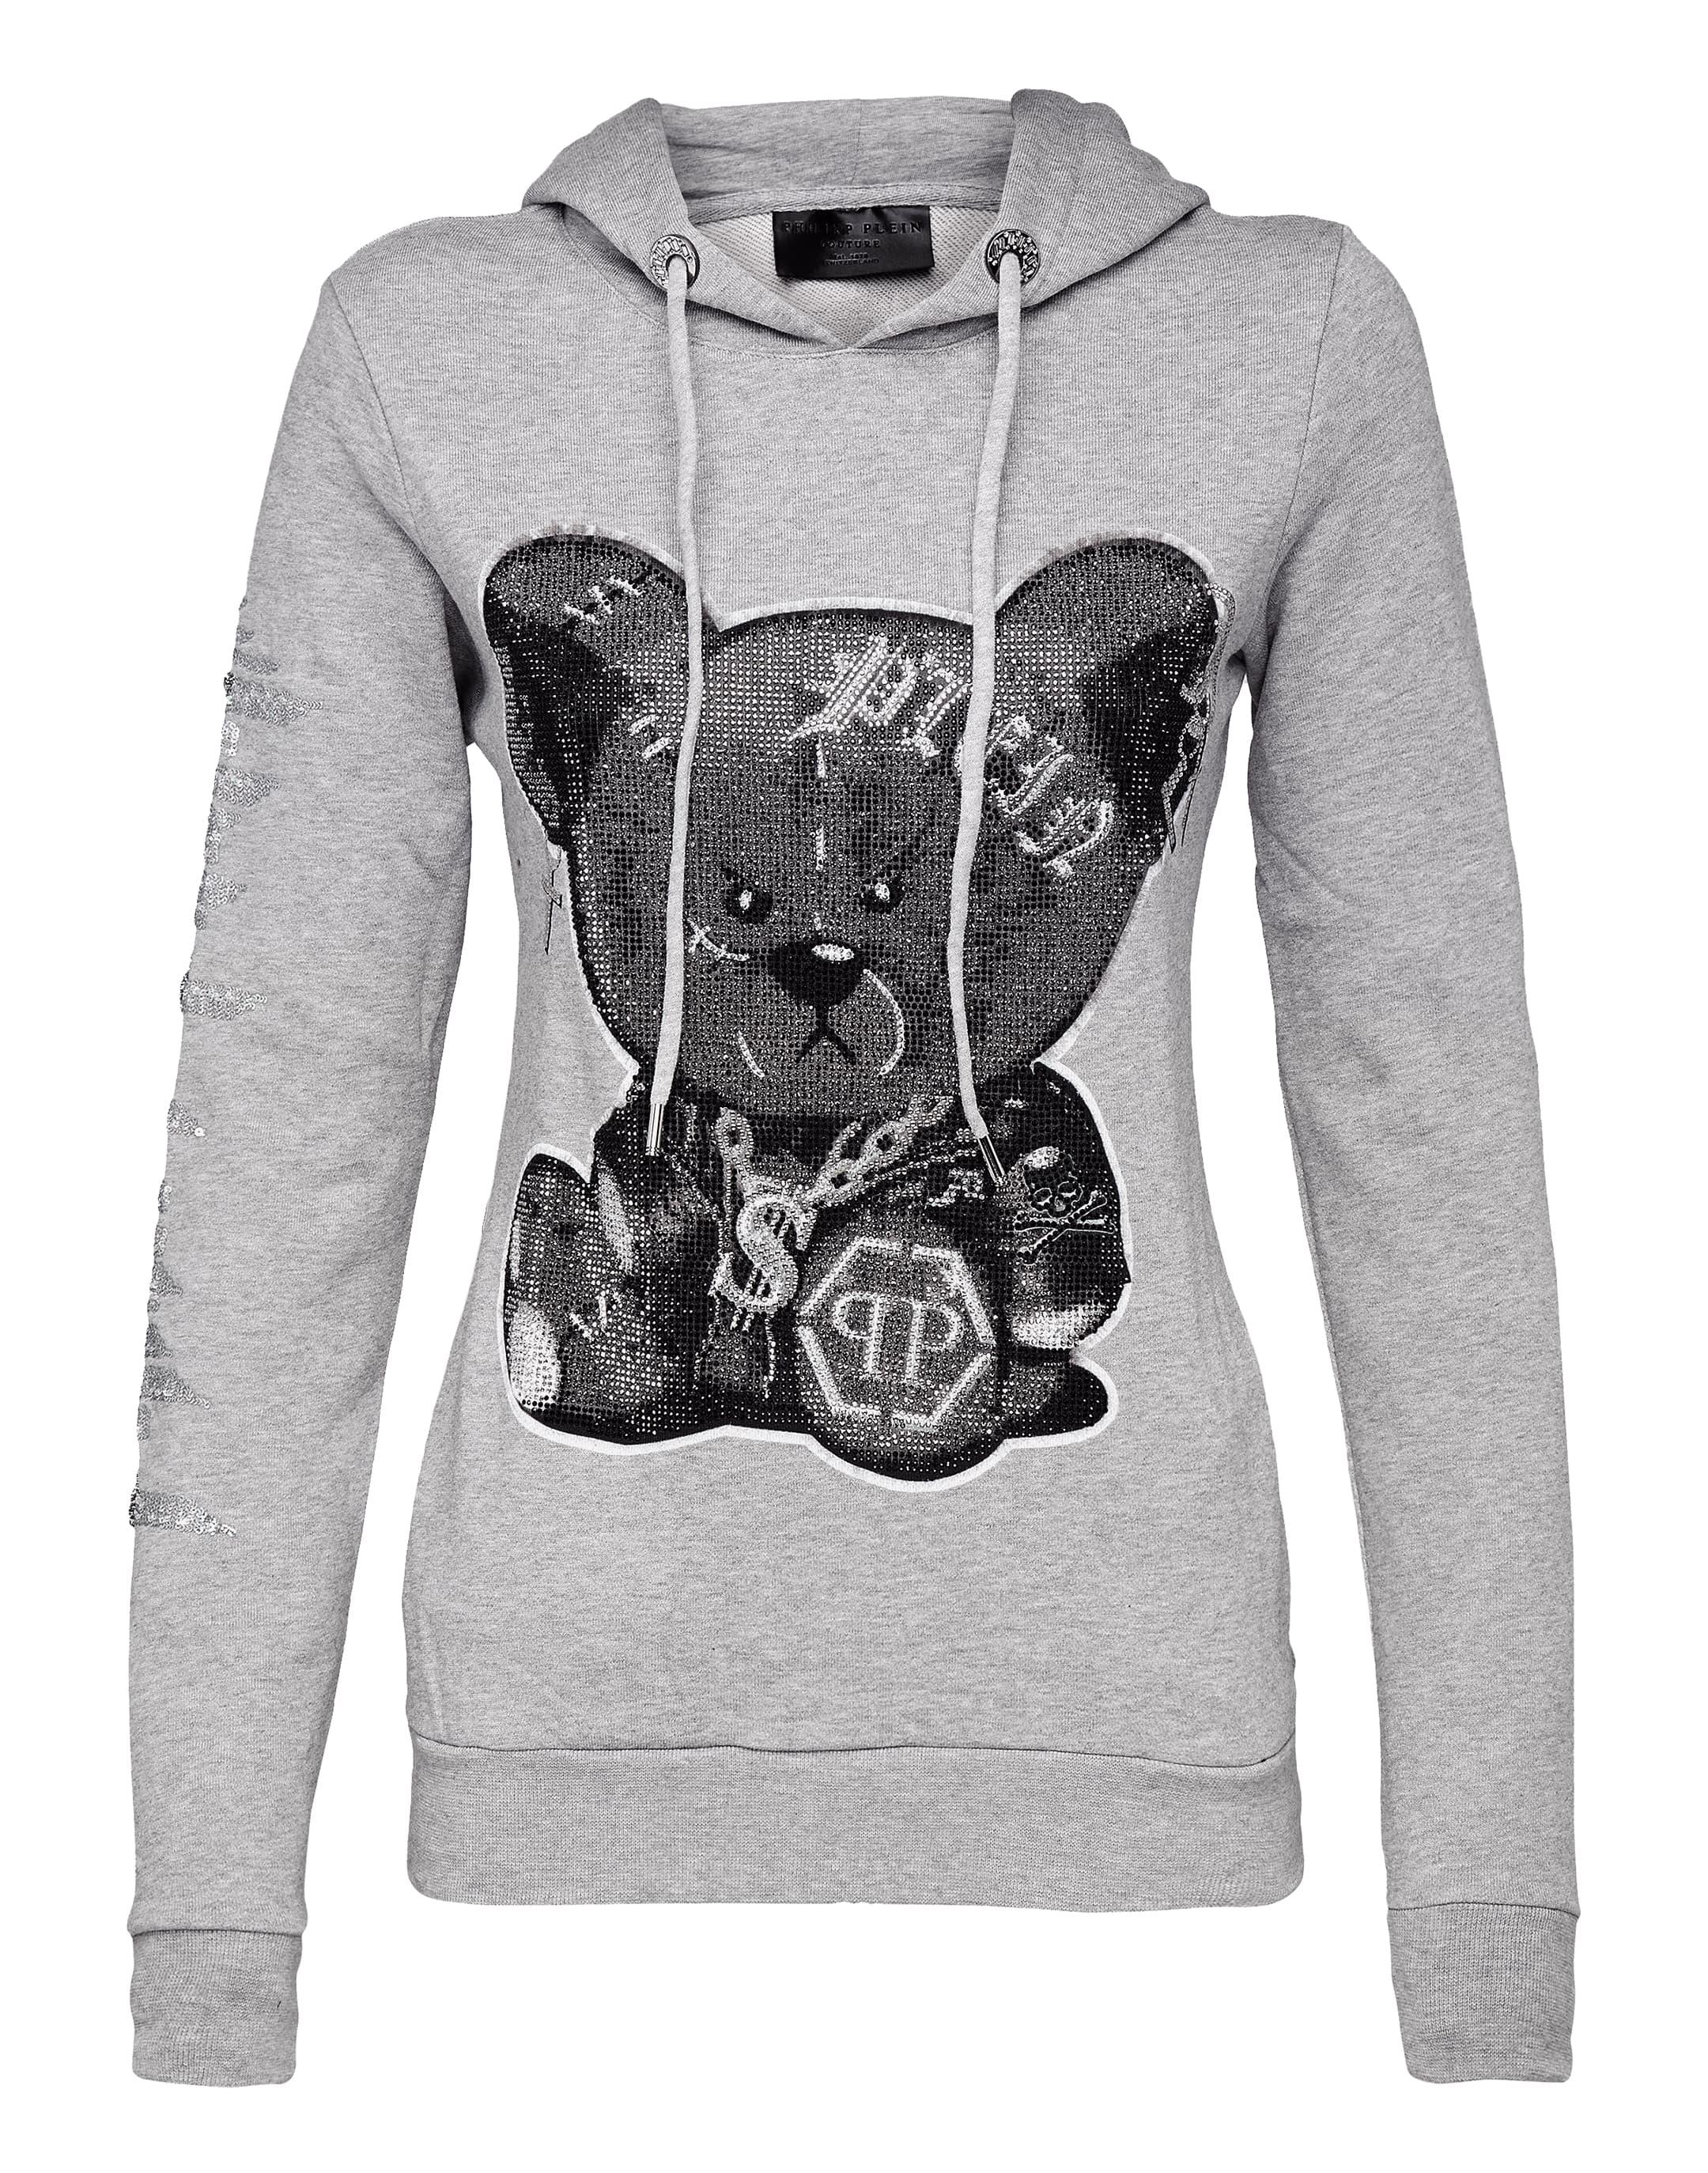 Hoodie Sweatshirt Teddy Bear in Grey from PHILIPP PLEIN